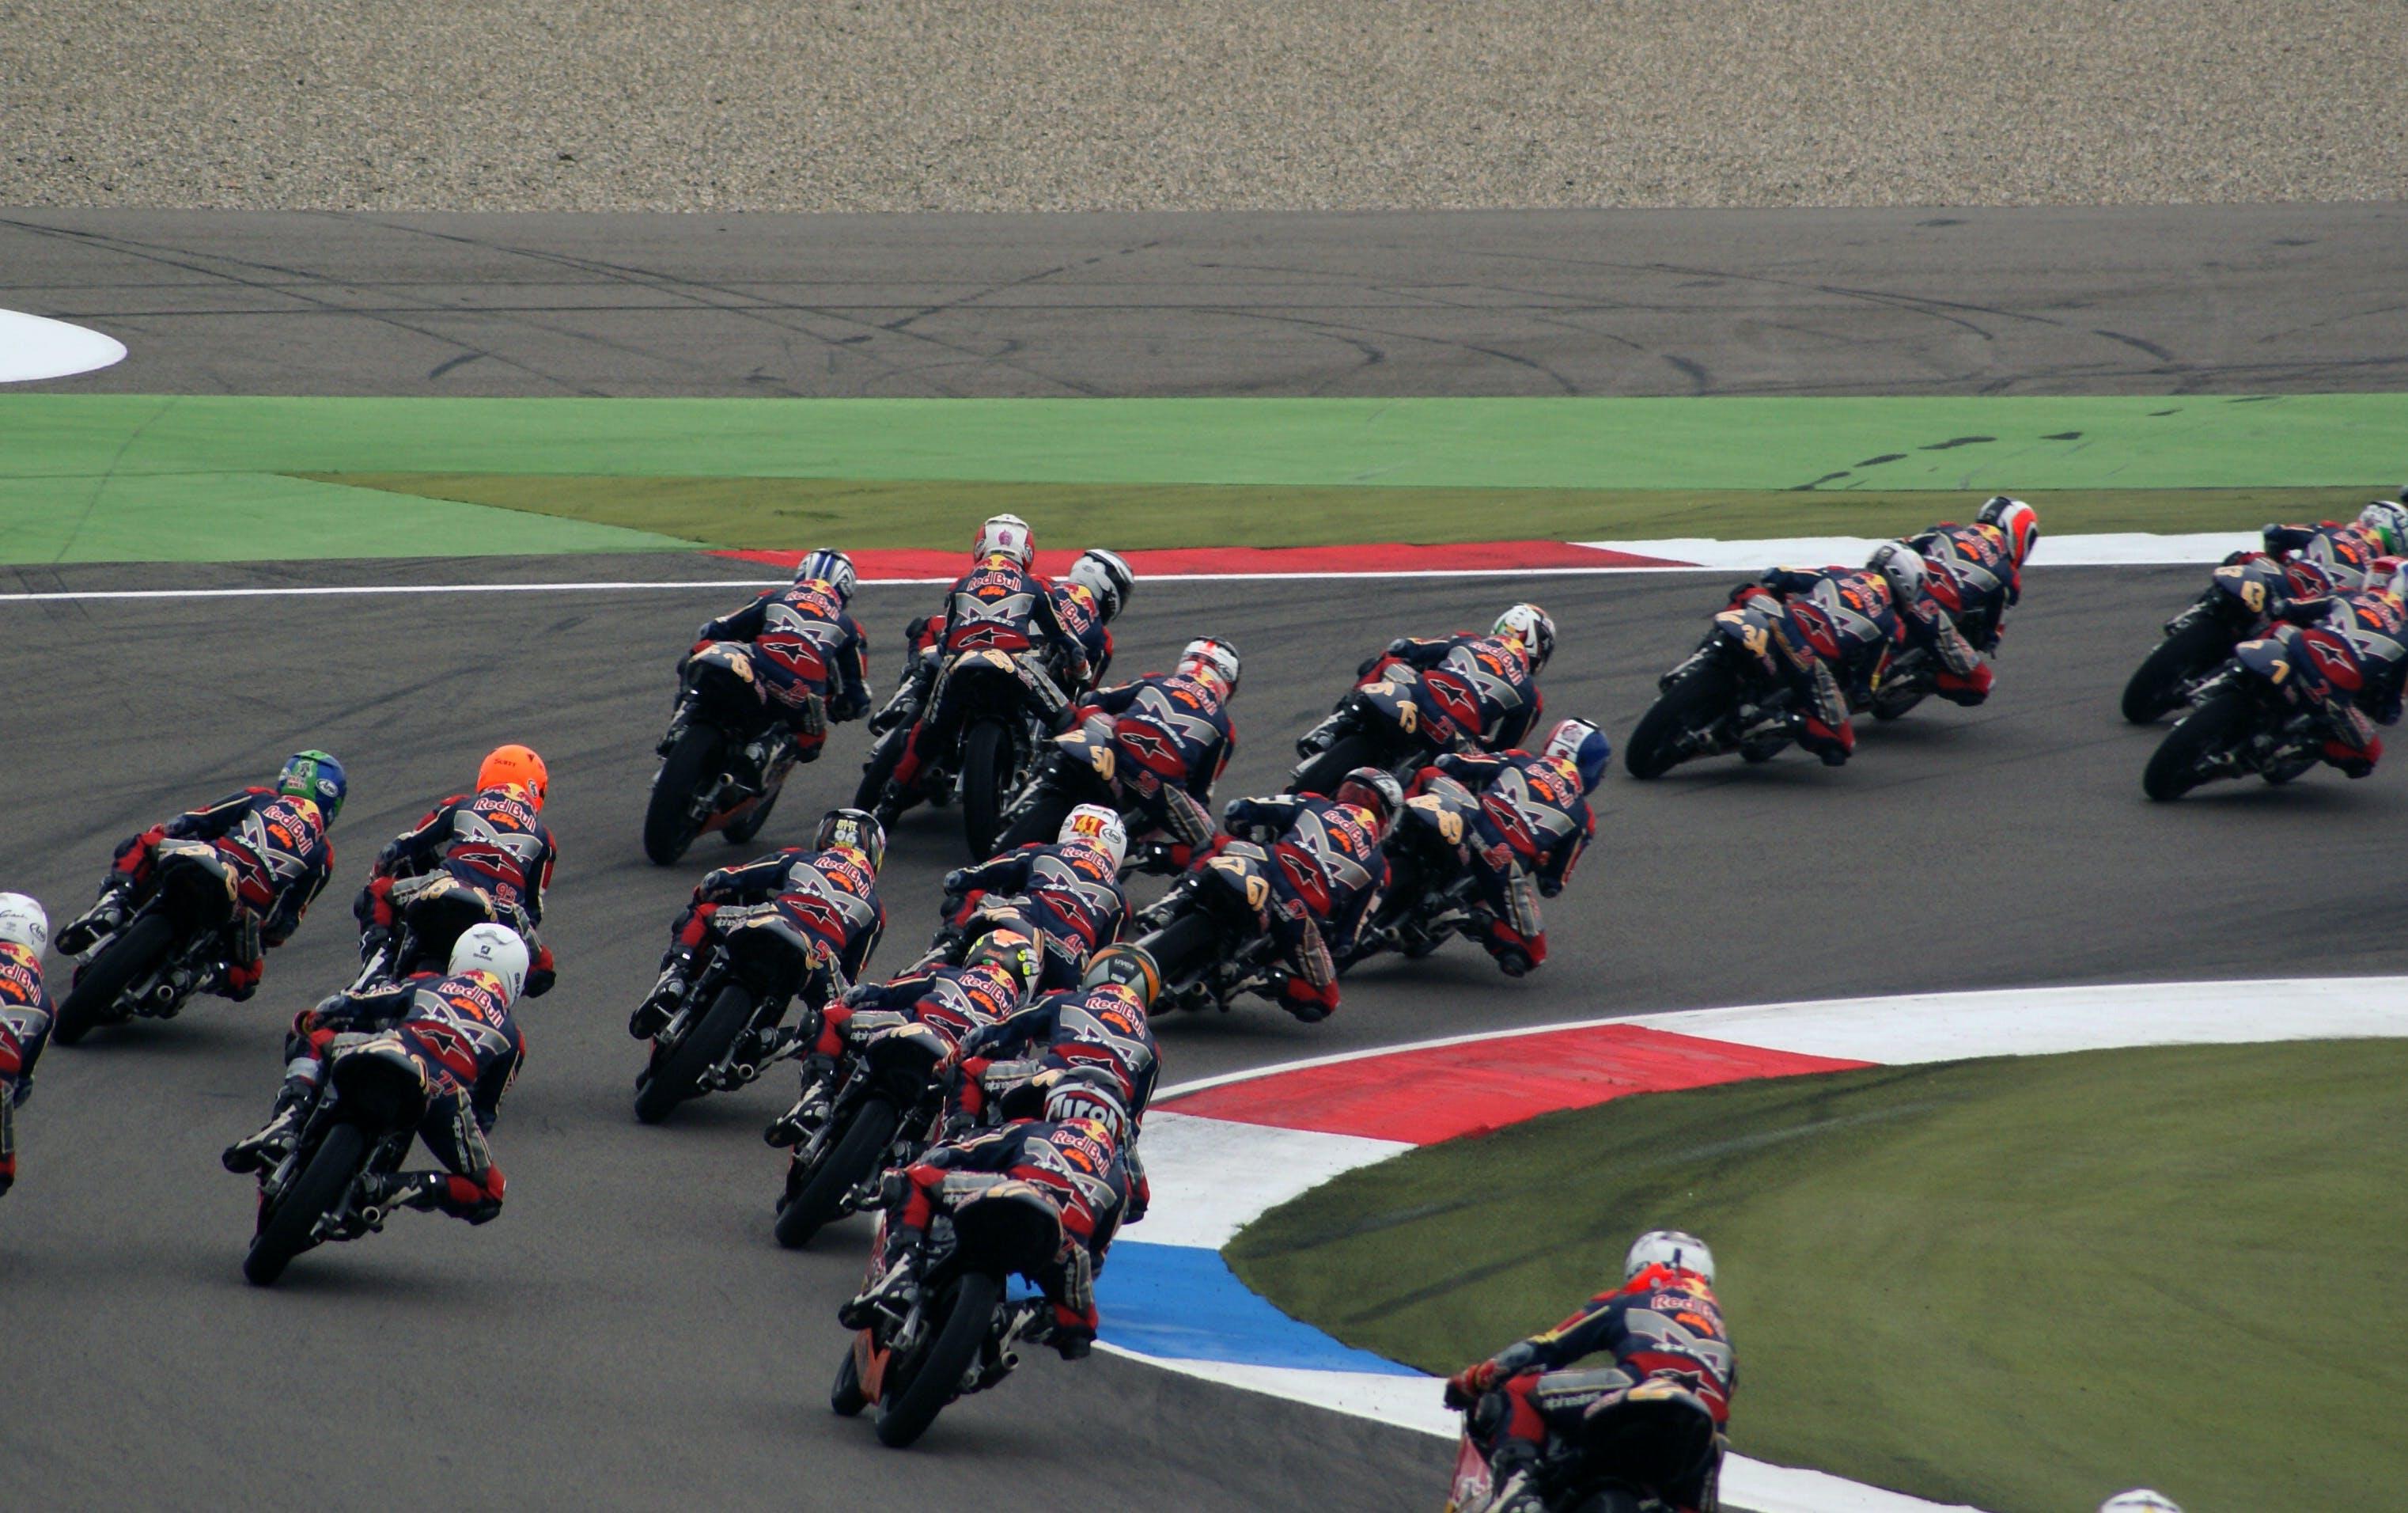 crash, motor racing, motorbike